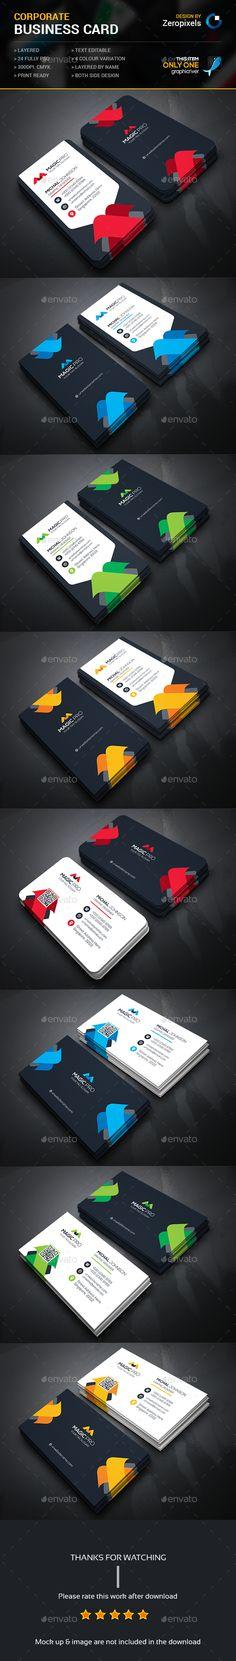 Modern business card template psd design download http modern business card template psd design download httpgraphicriveritemmodern business card13587606refksioks business card templates cheaphphosting Choice Image